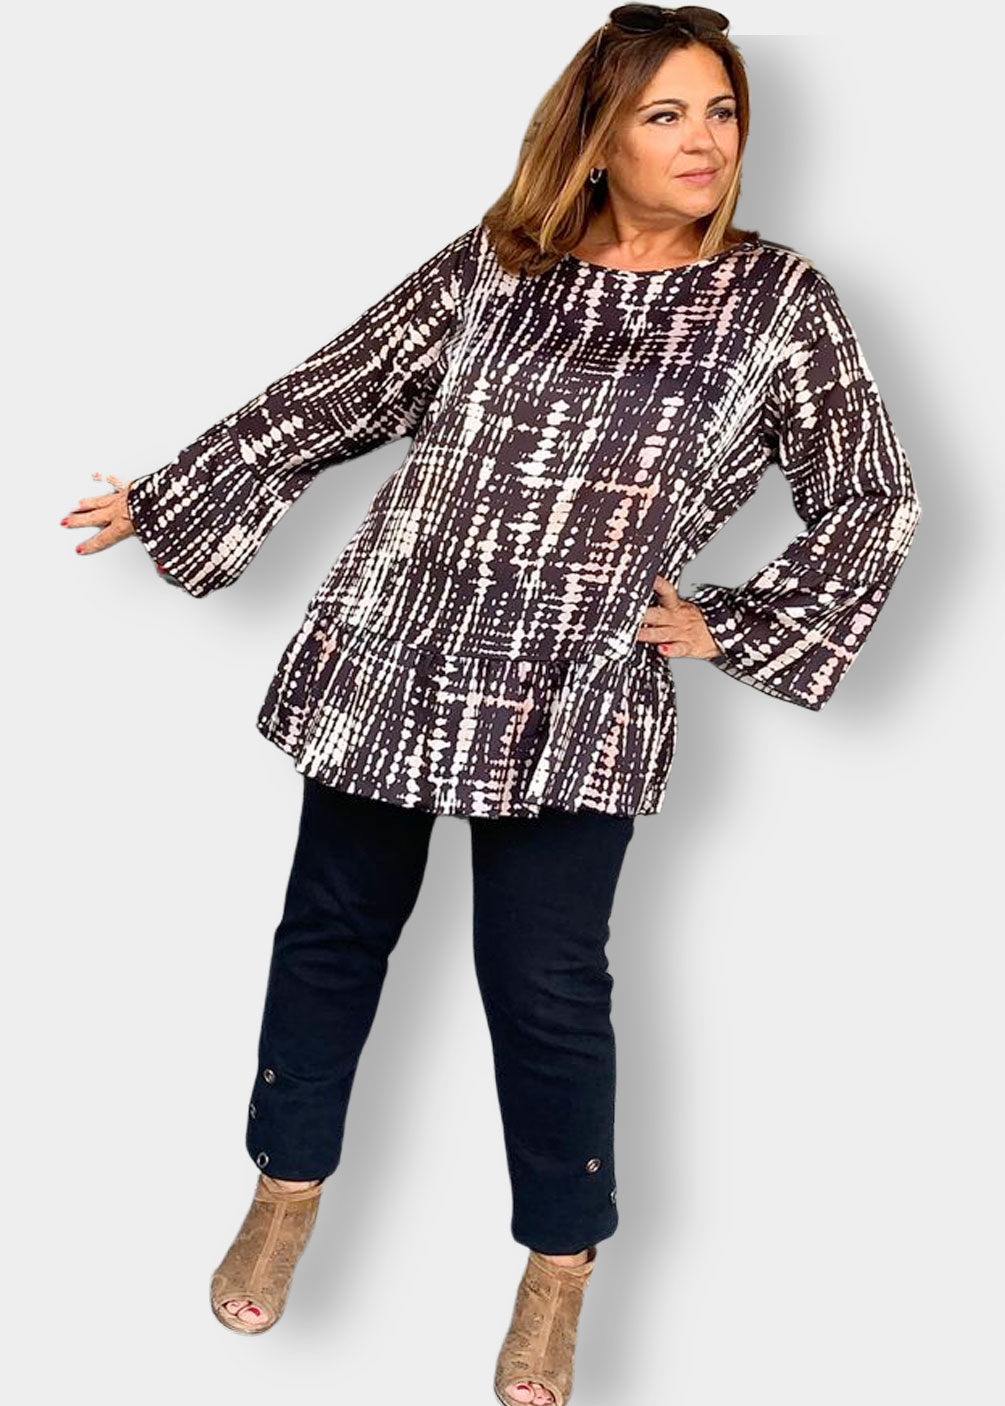 camiseta blusa tallas grandes indra invierno2021